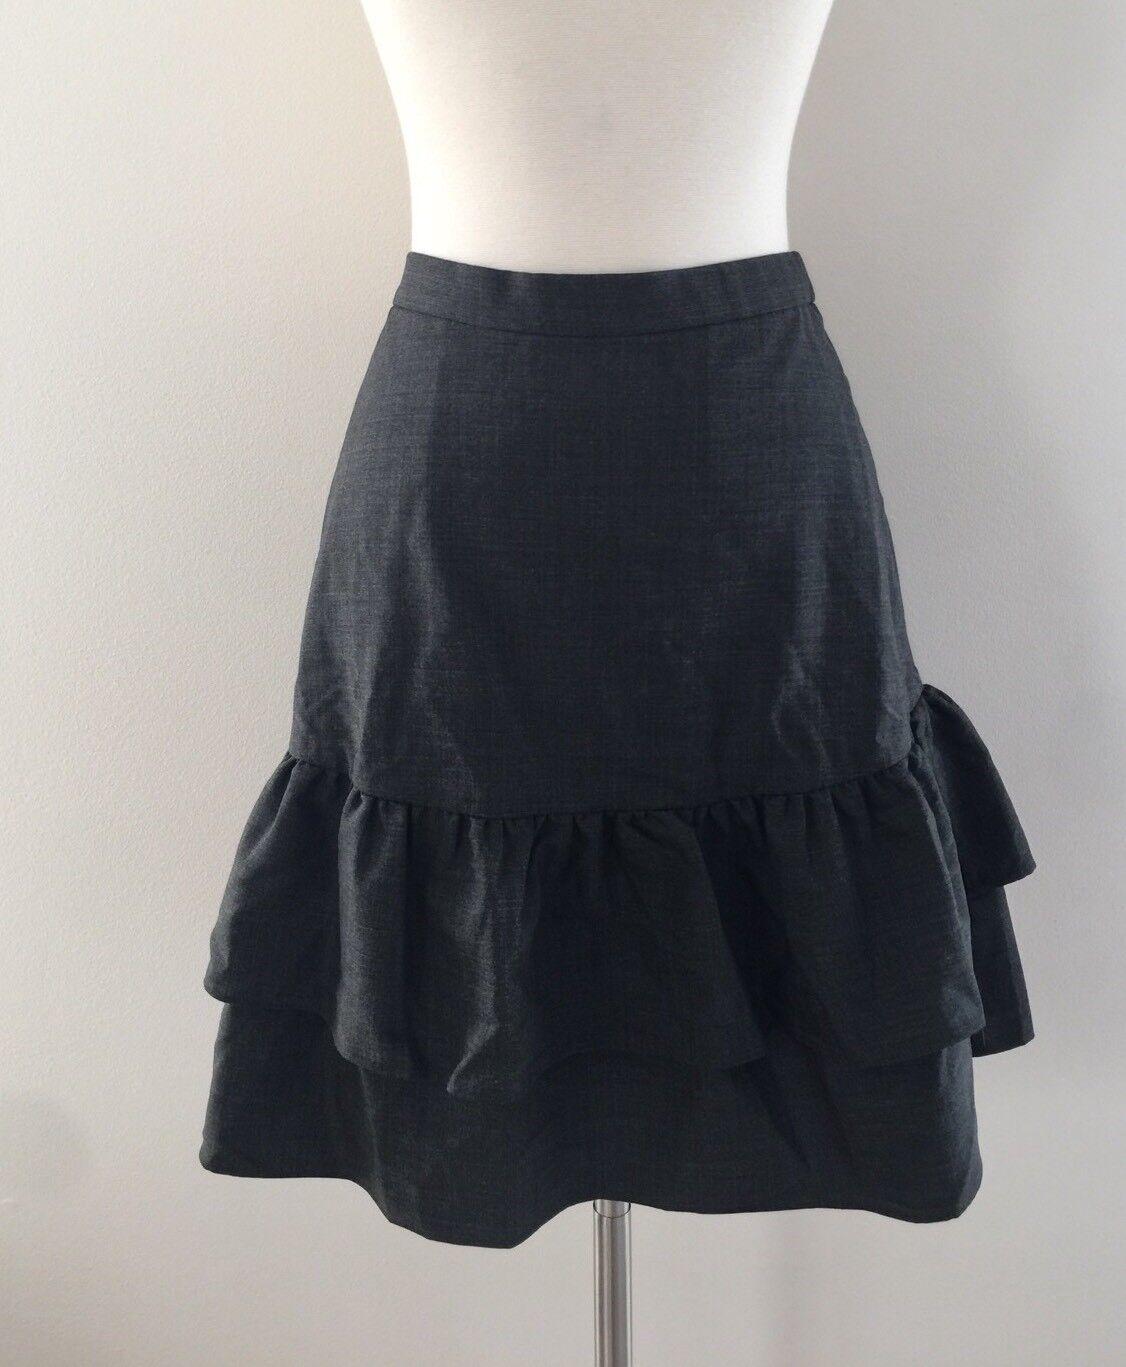 New Jcrew Tall wool flannel ruffle Office skirt Heather Charcoal Grey G8871  8T